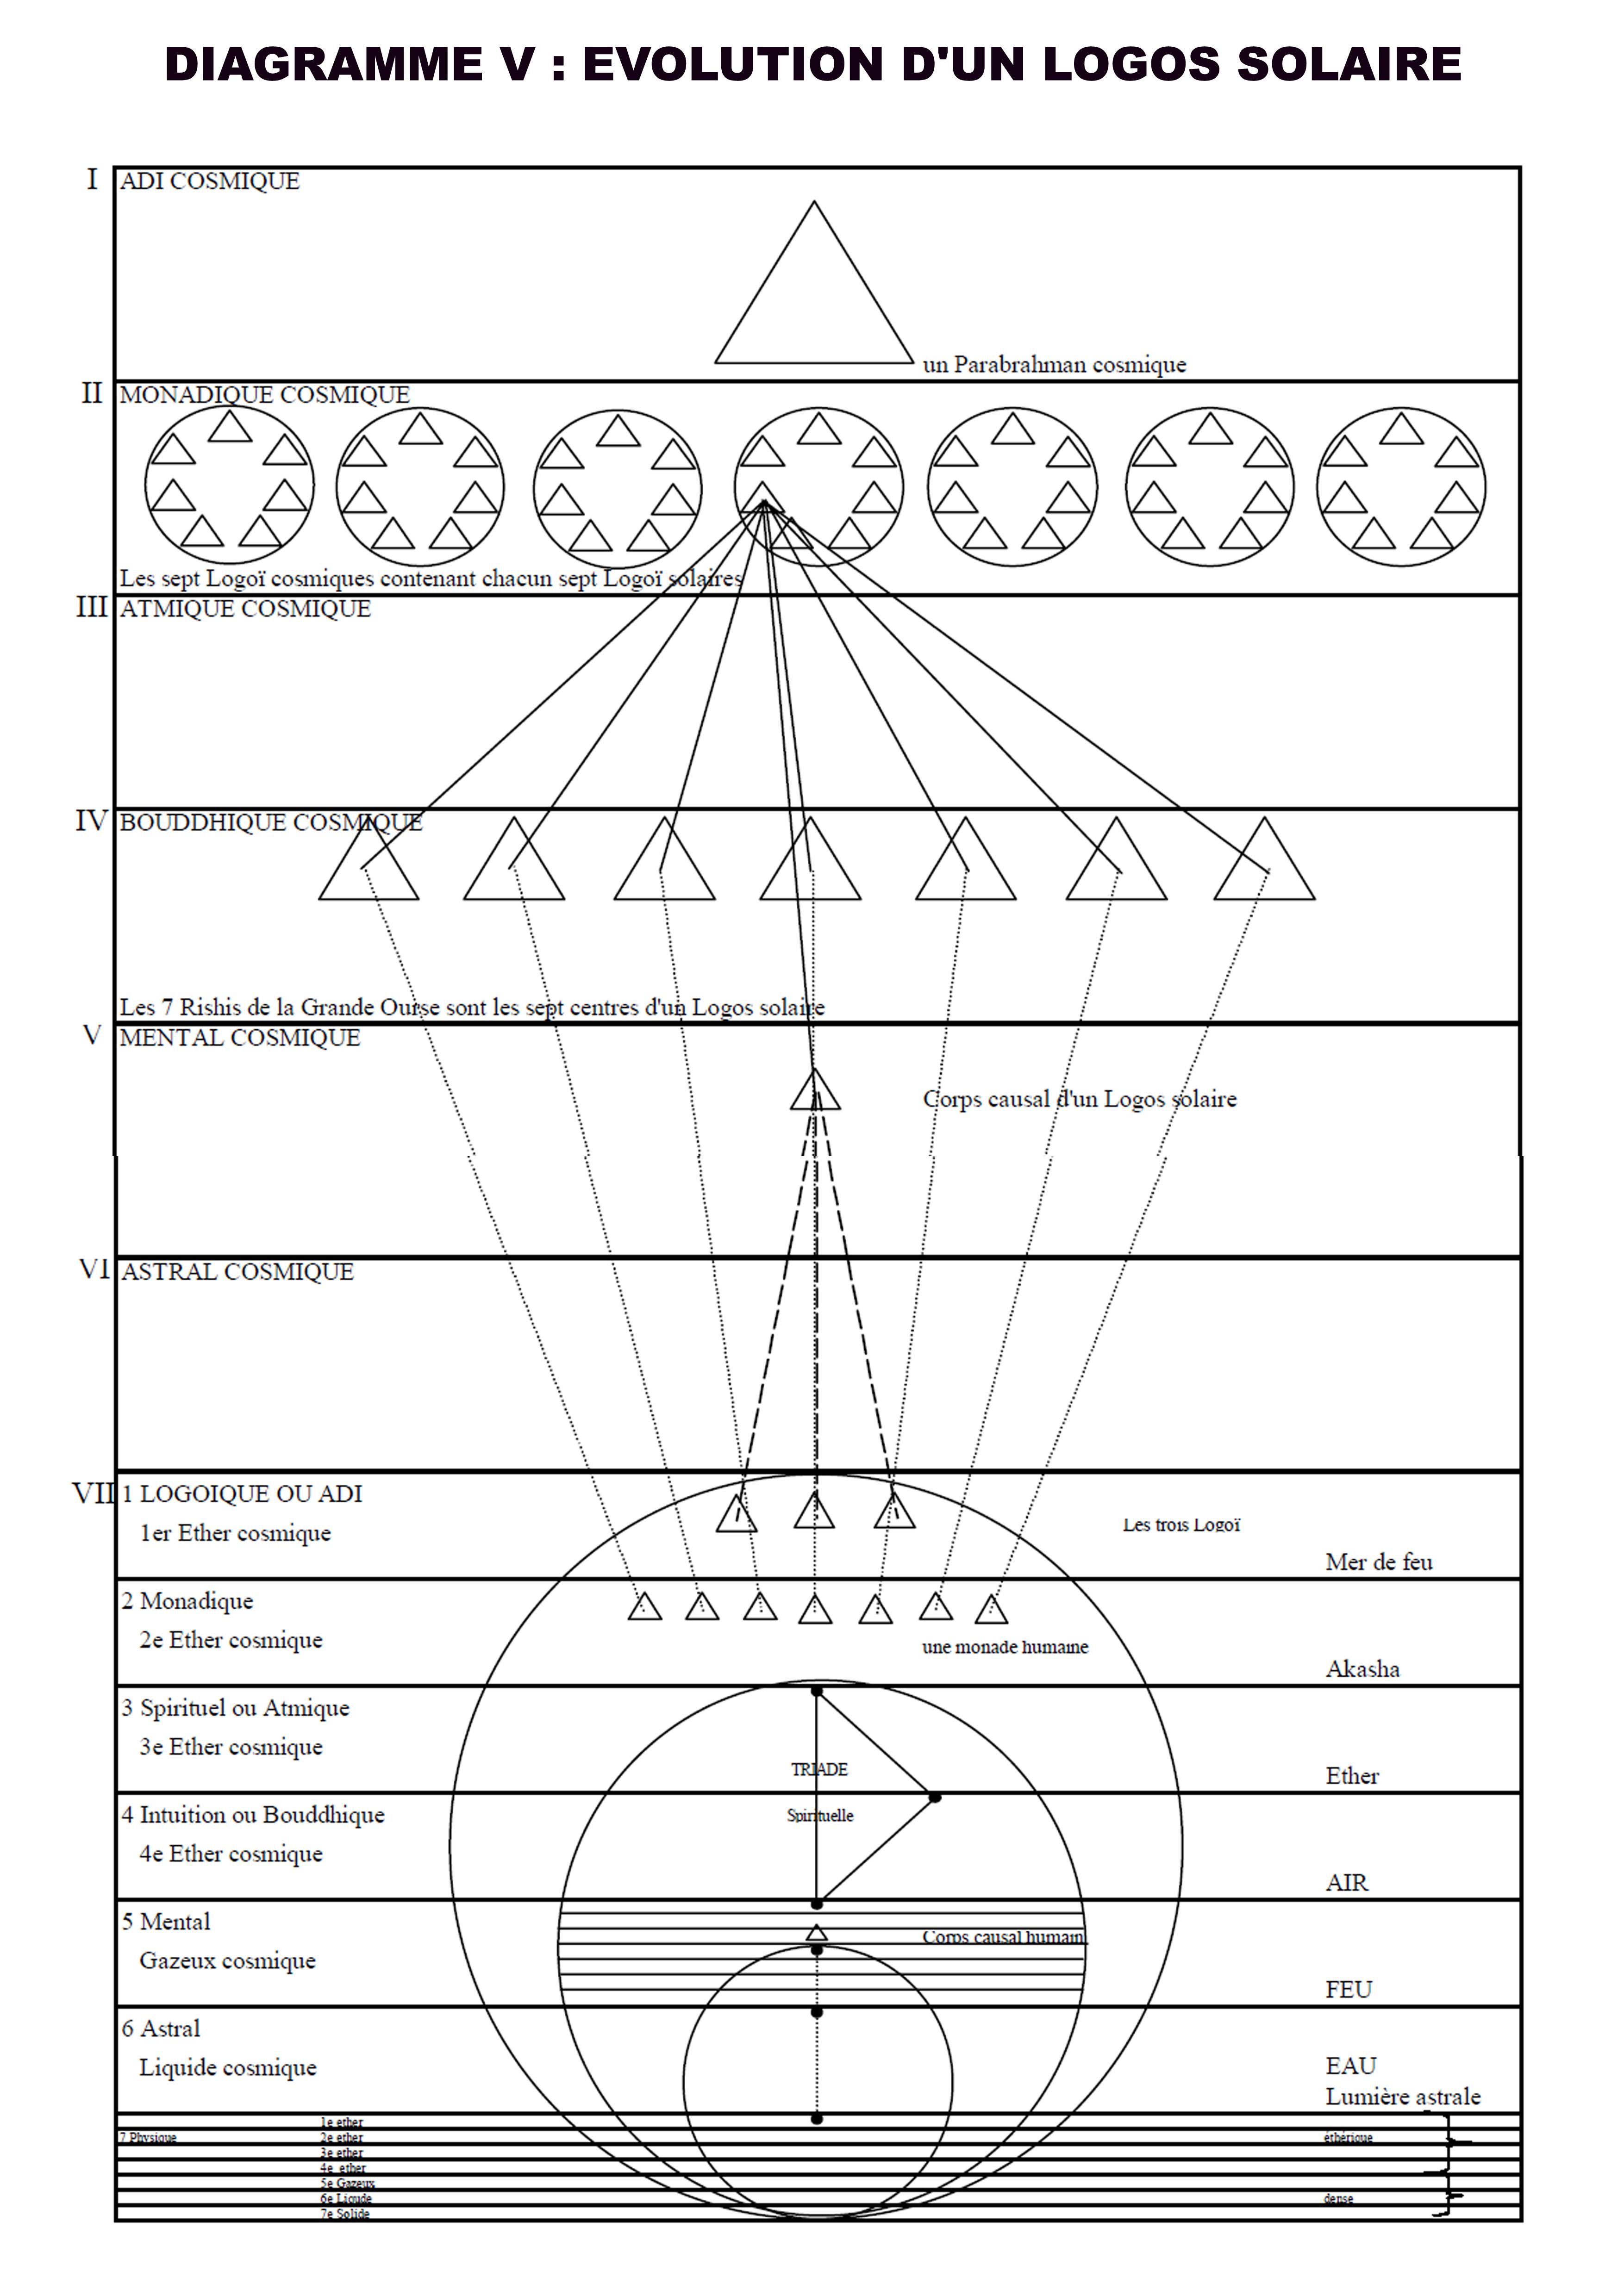 Diagramme 5